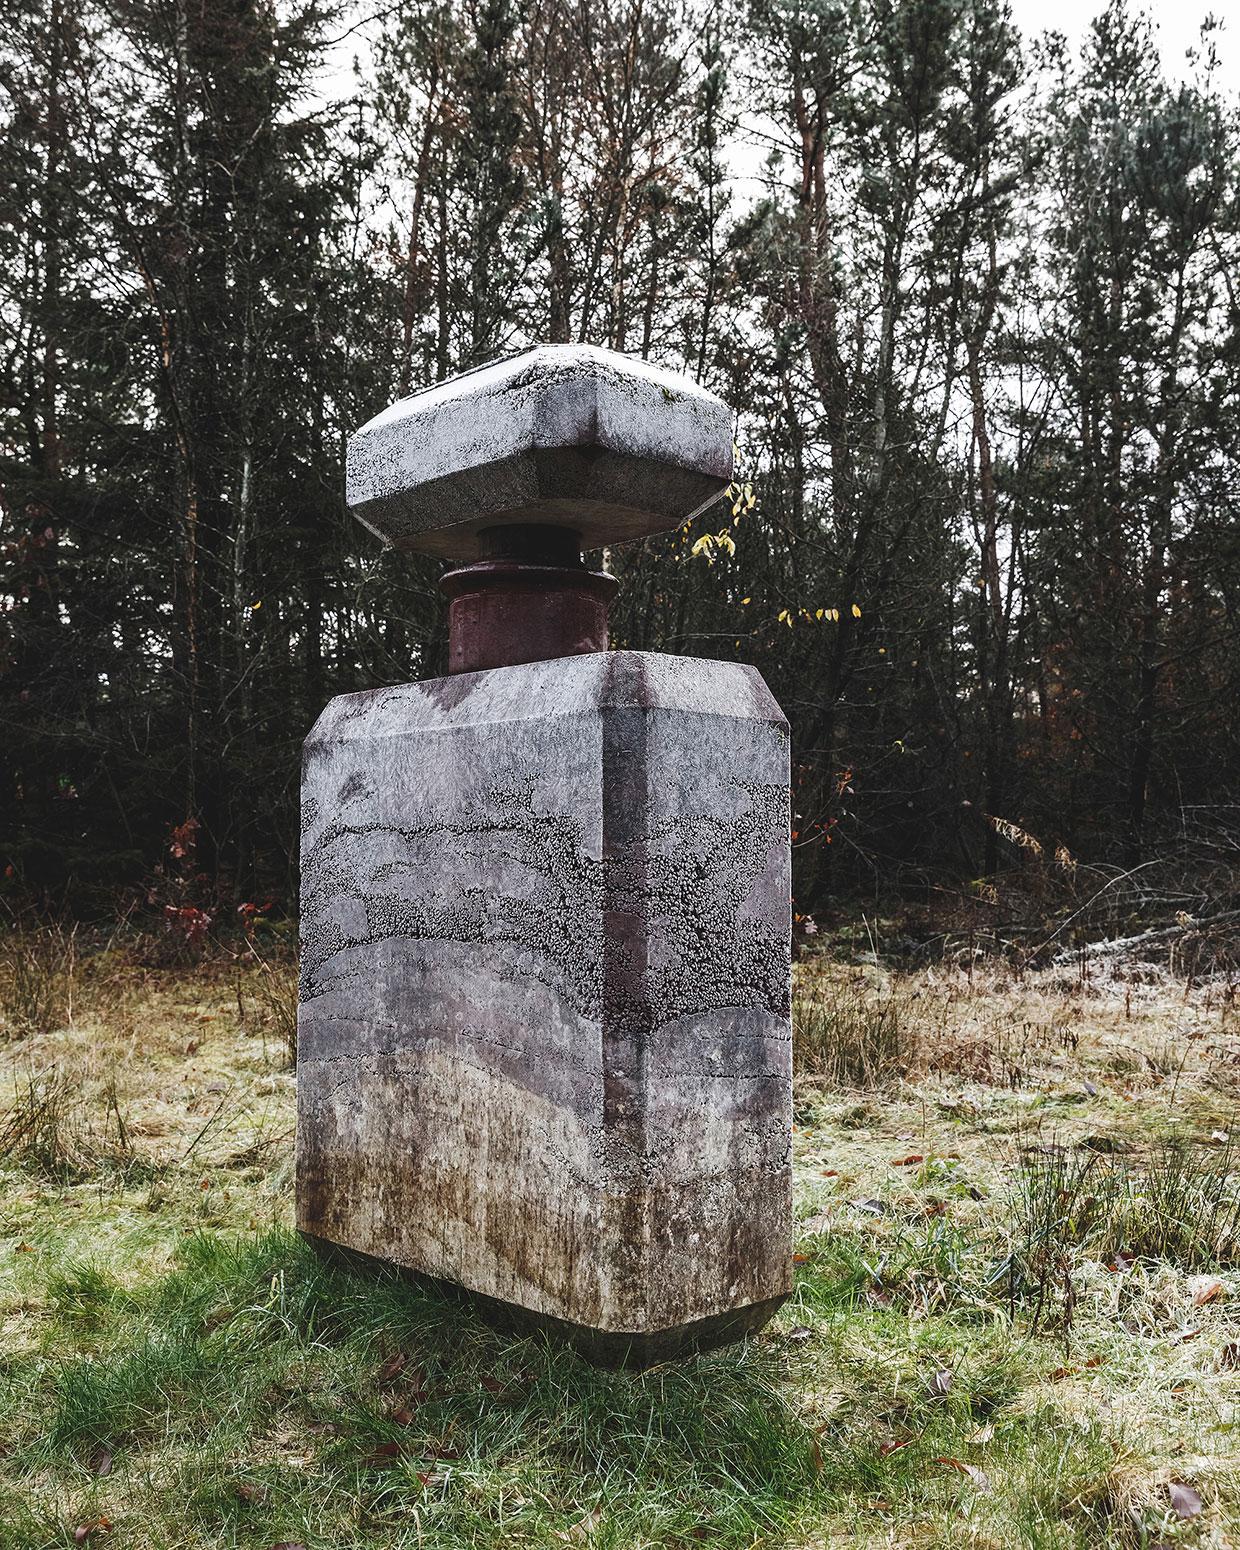 Nanna Abell, AW14 (Concrete Flacon), 2014. Deep Forest Art Land (Skovsnogen). Photo: R. Hjortshøj